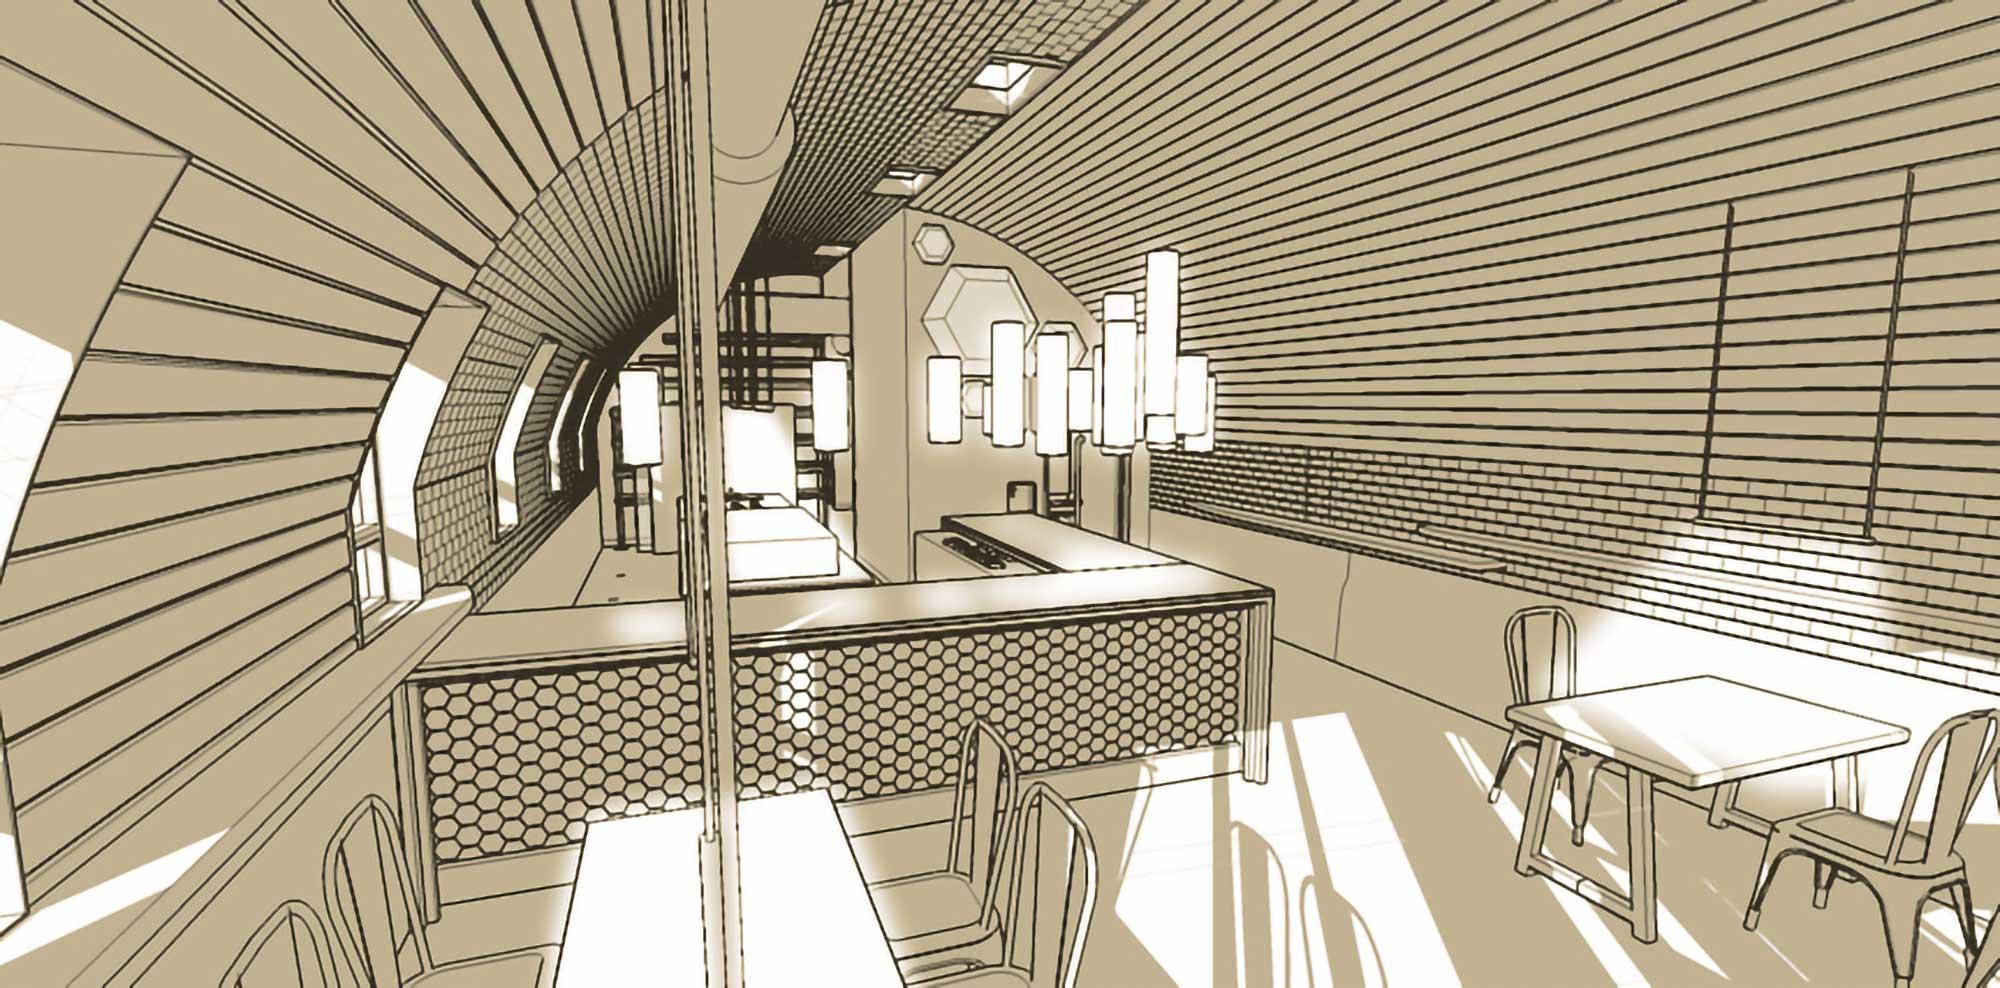 Restaurant Interior dining space rendering